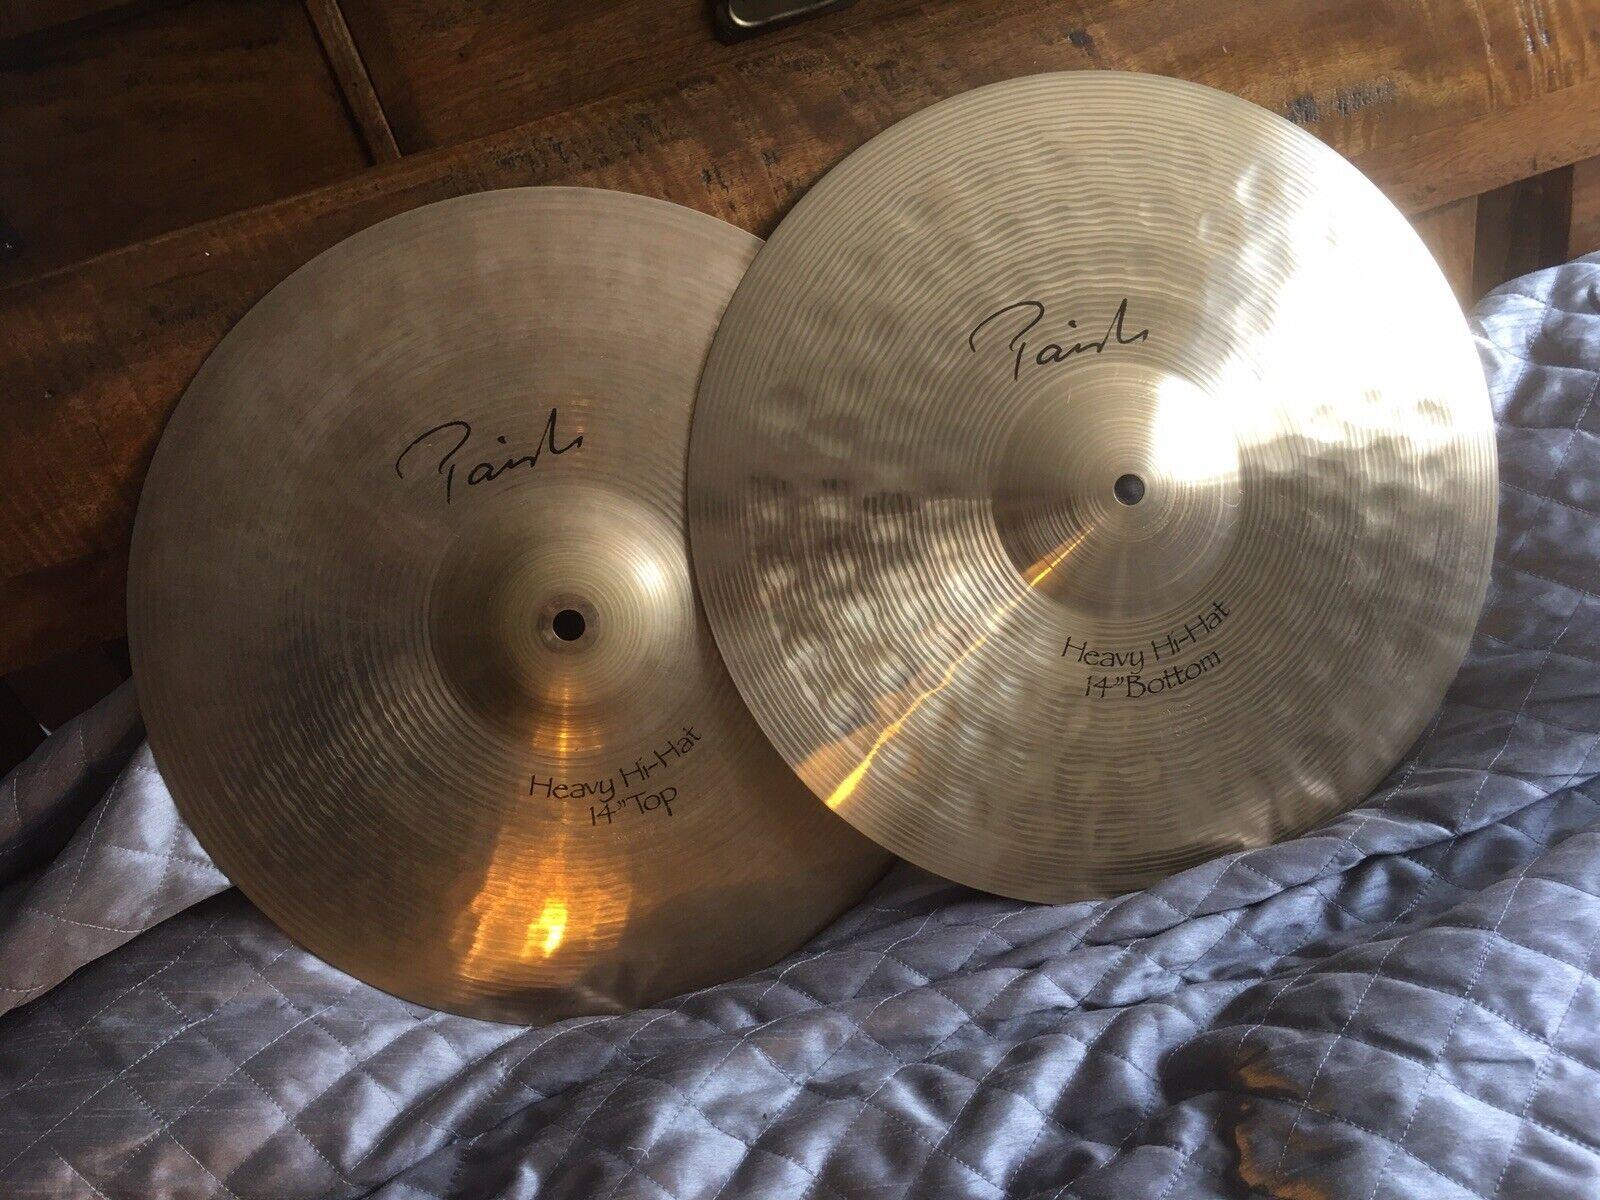 Paiste Signature 14 heavy hi hat cymbals